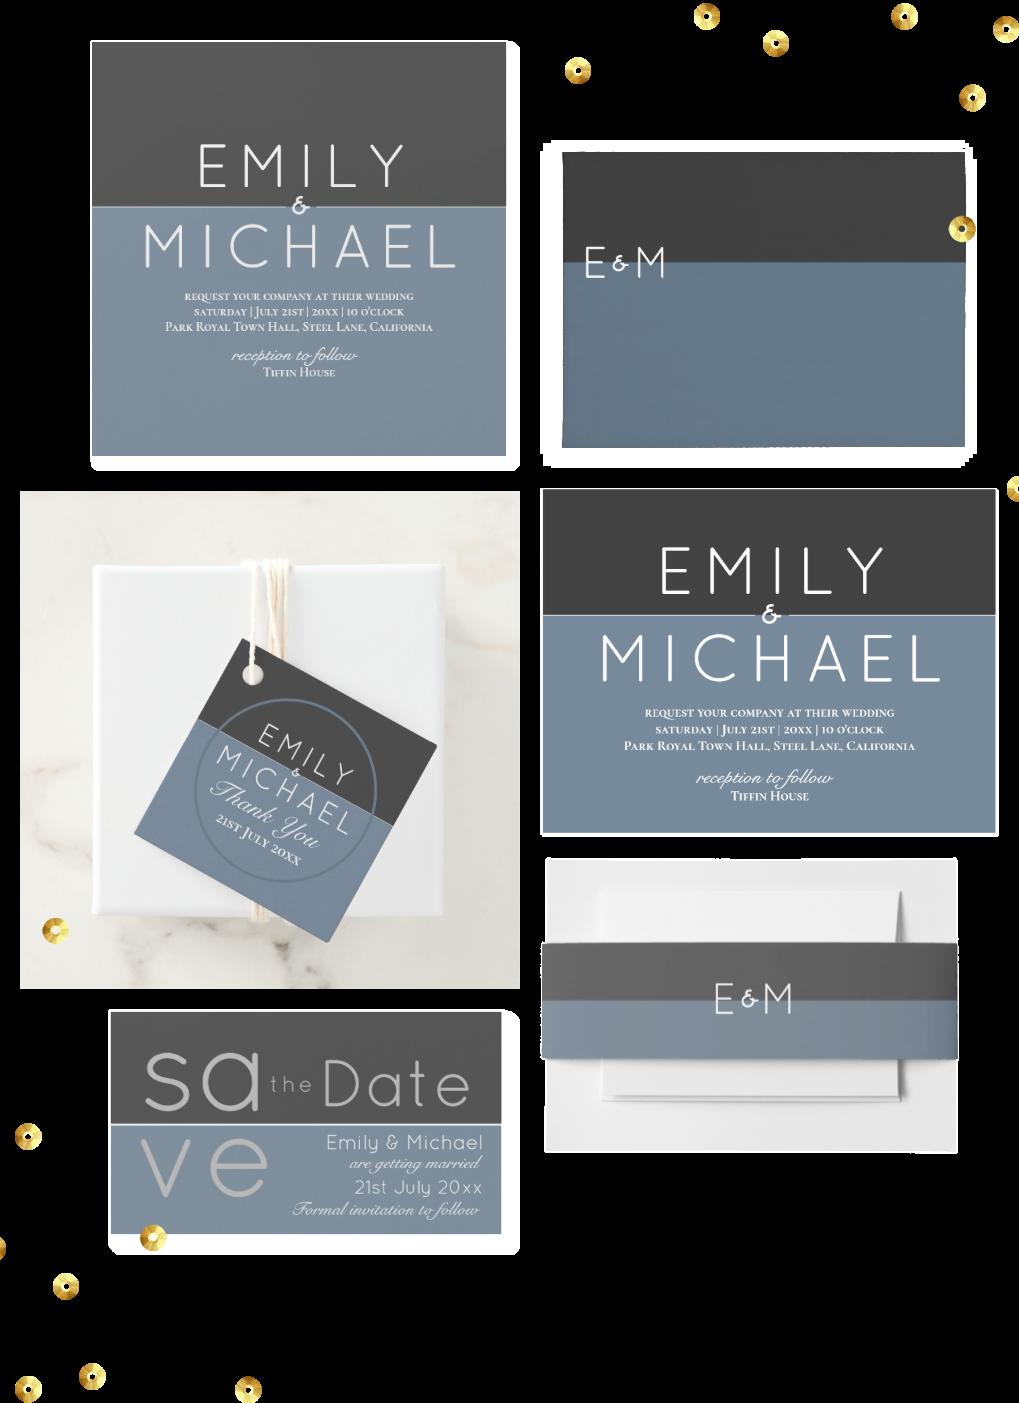 winter wedding invitations 2019 2020 steel navy blue white